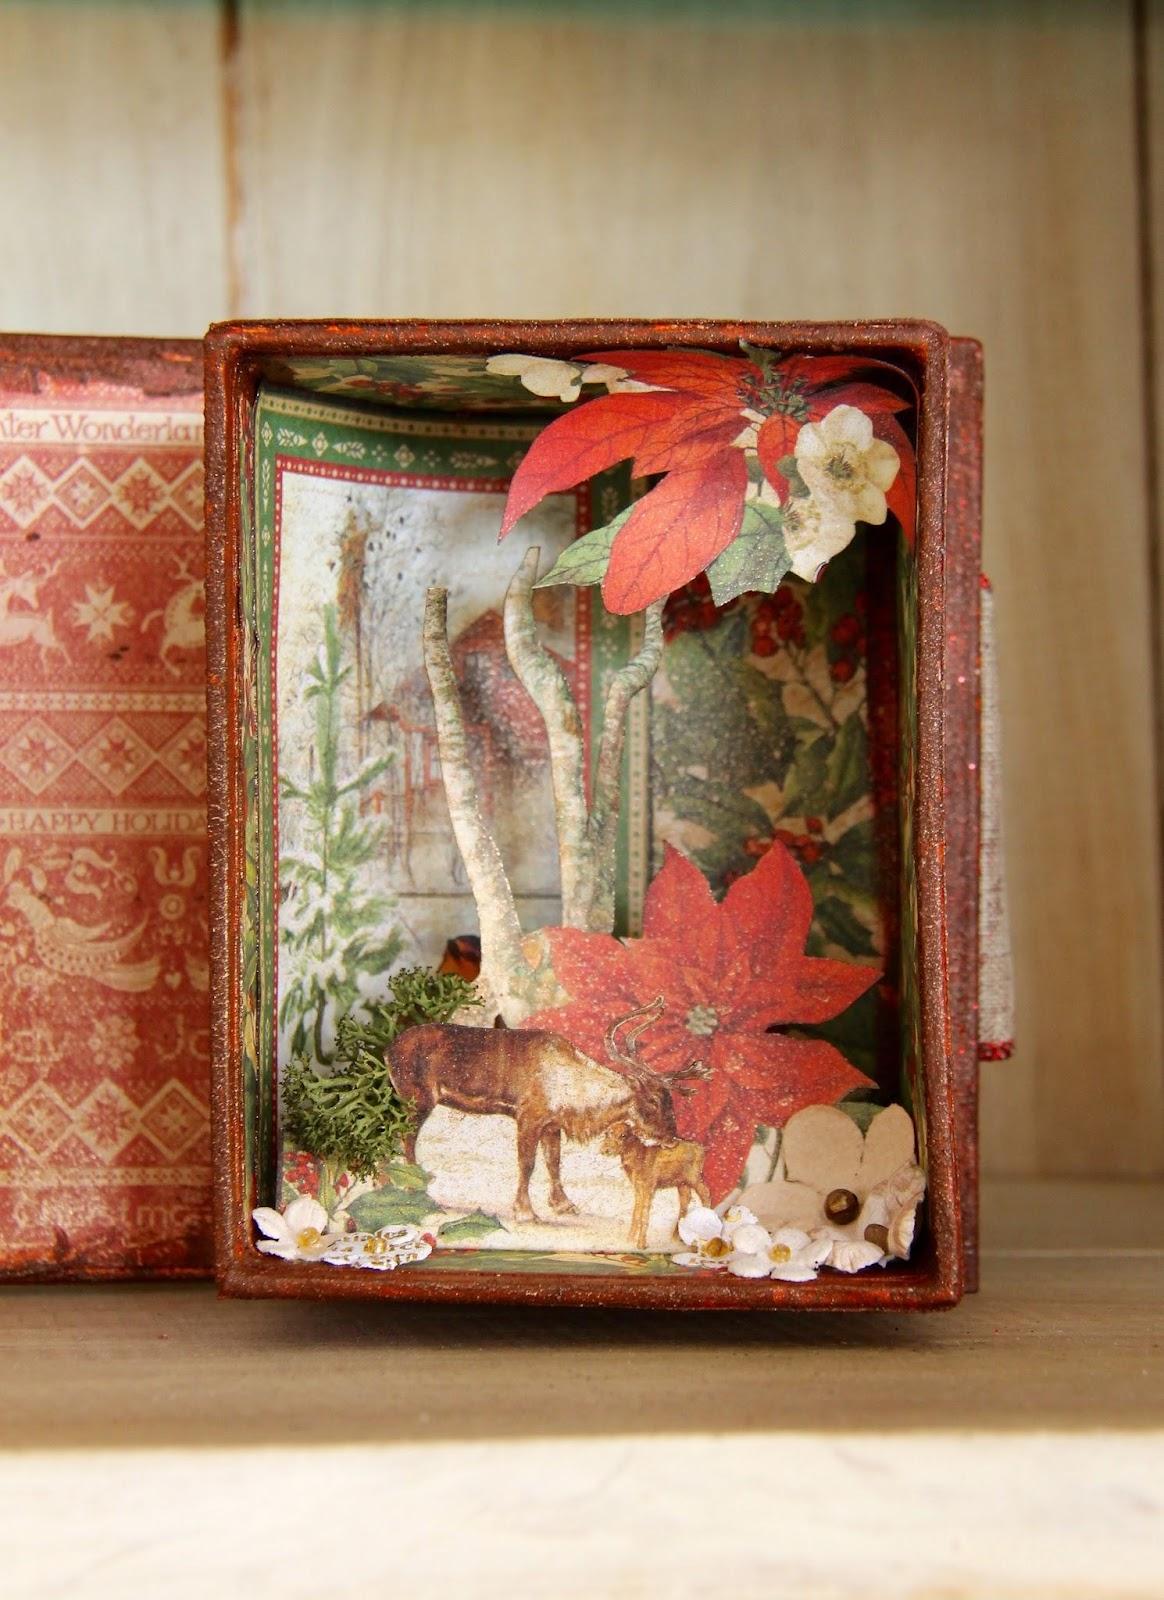 Winter Wonderland Book Box by Marina Blaukitchen Product by Graphic 45 photo 5.jpg